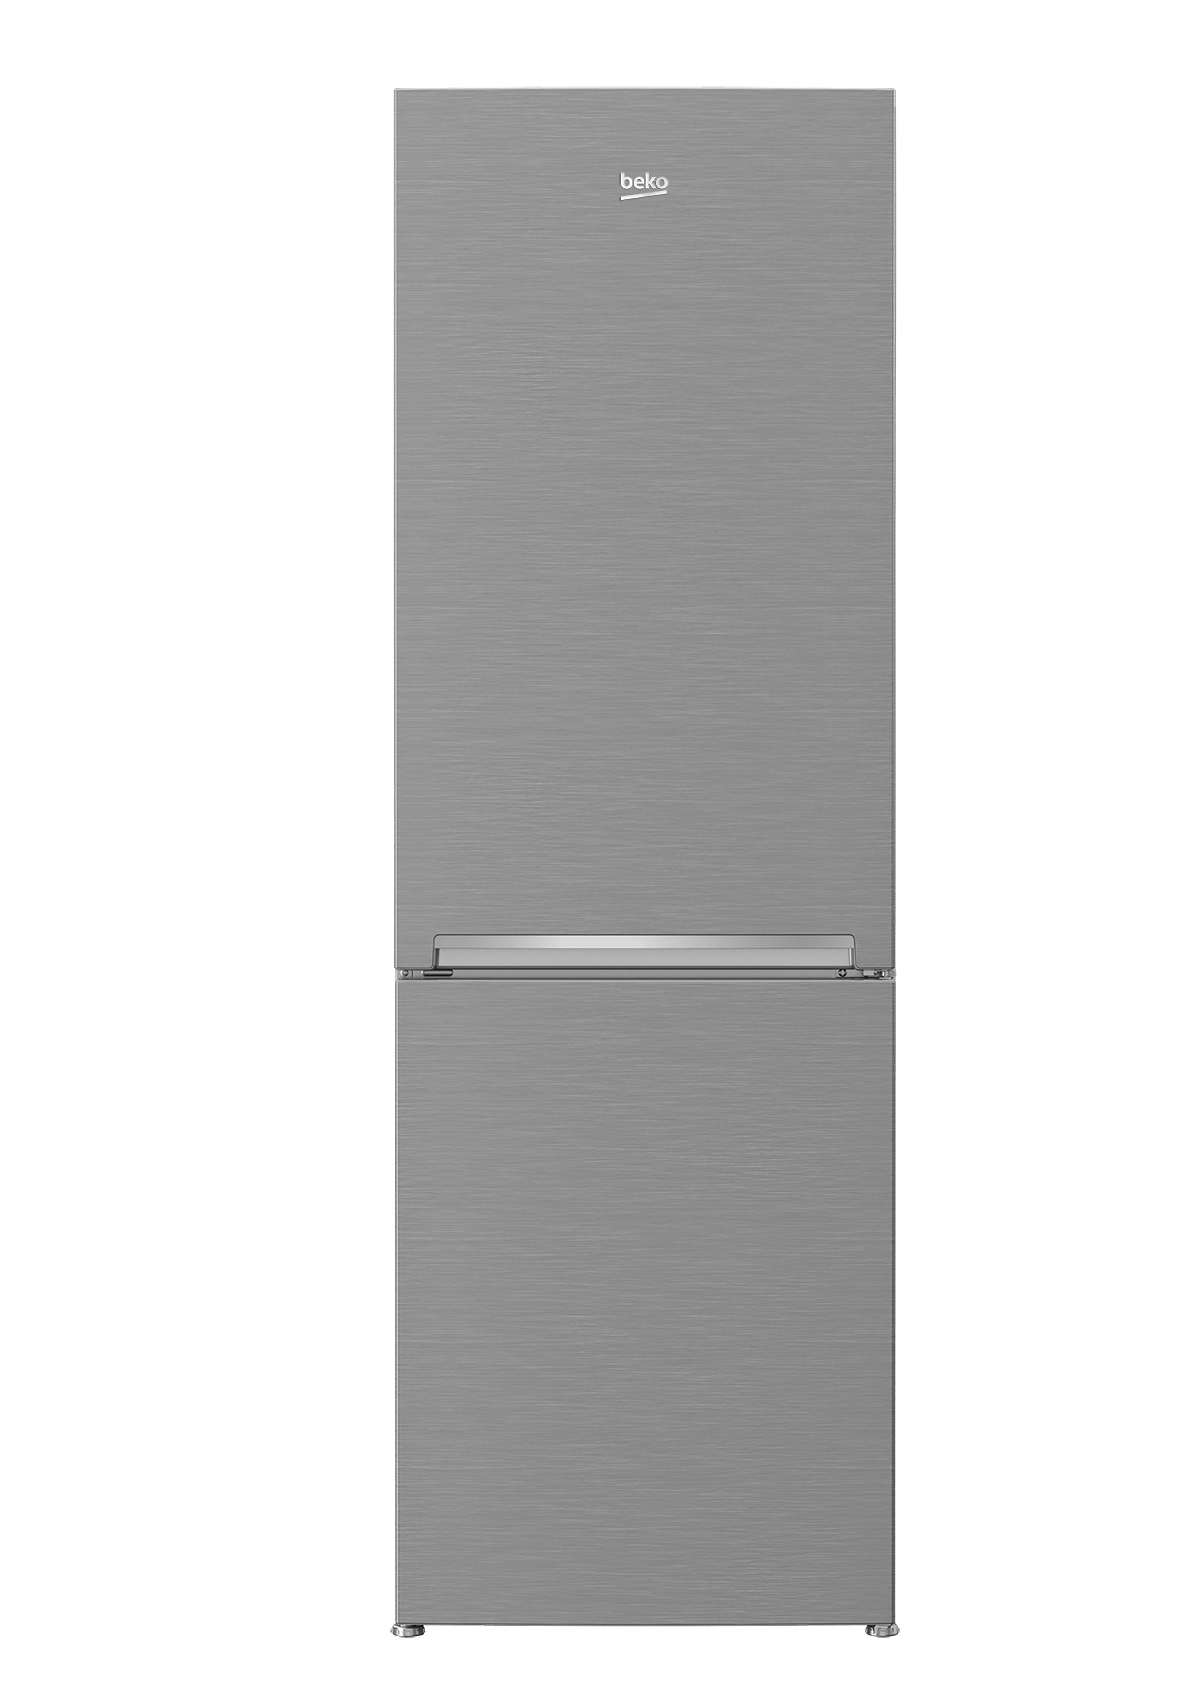 "Beko24"" Freezer Bottom Stainless Steel Refrigerator"